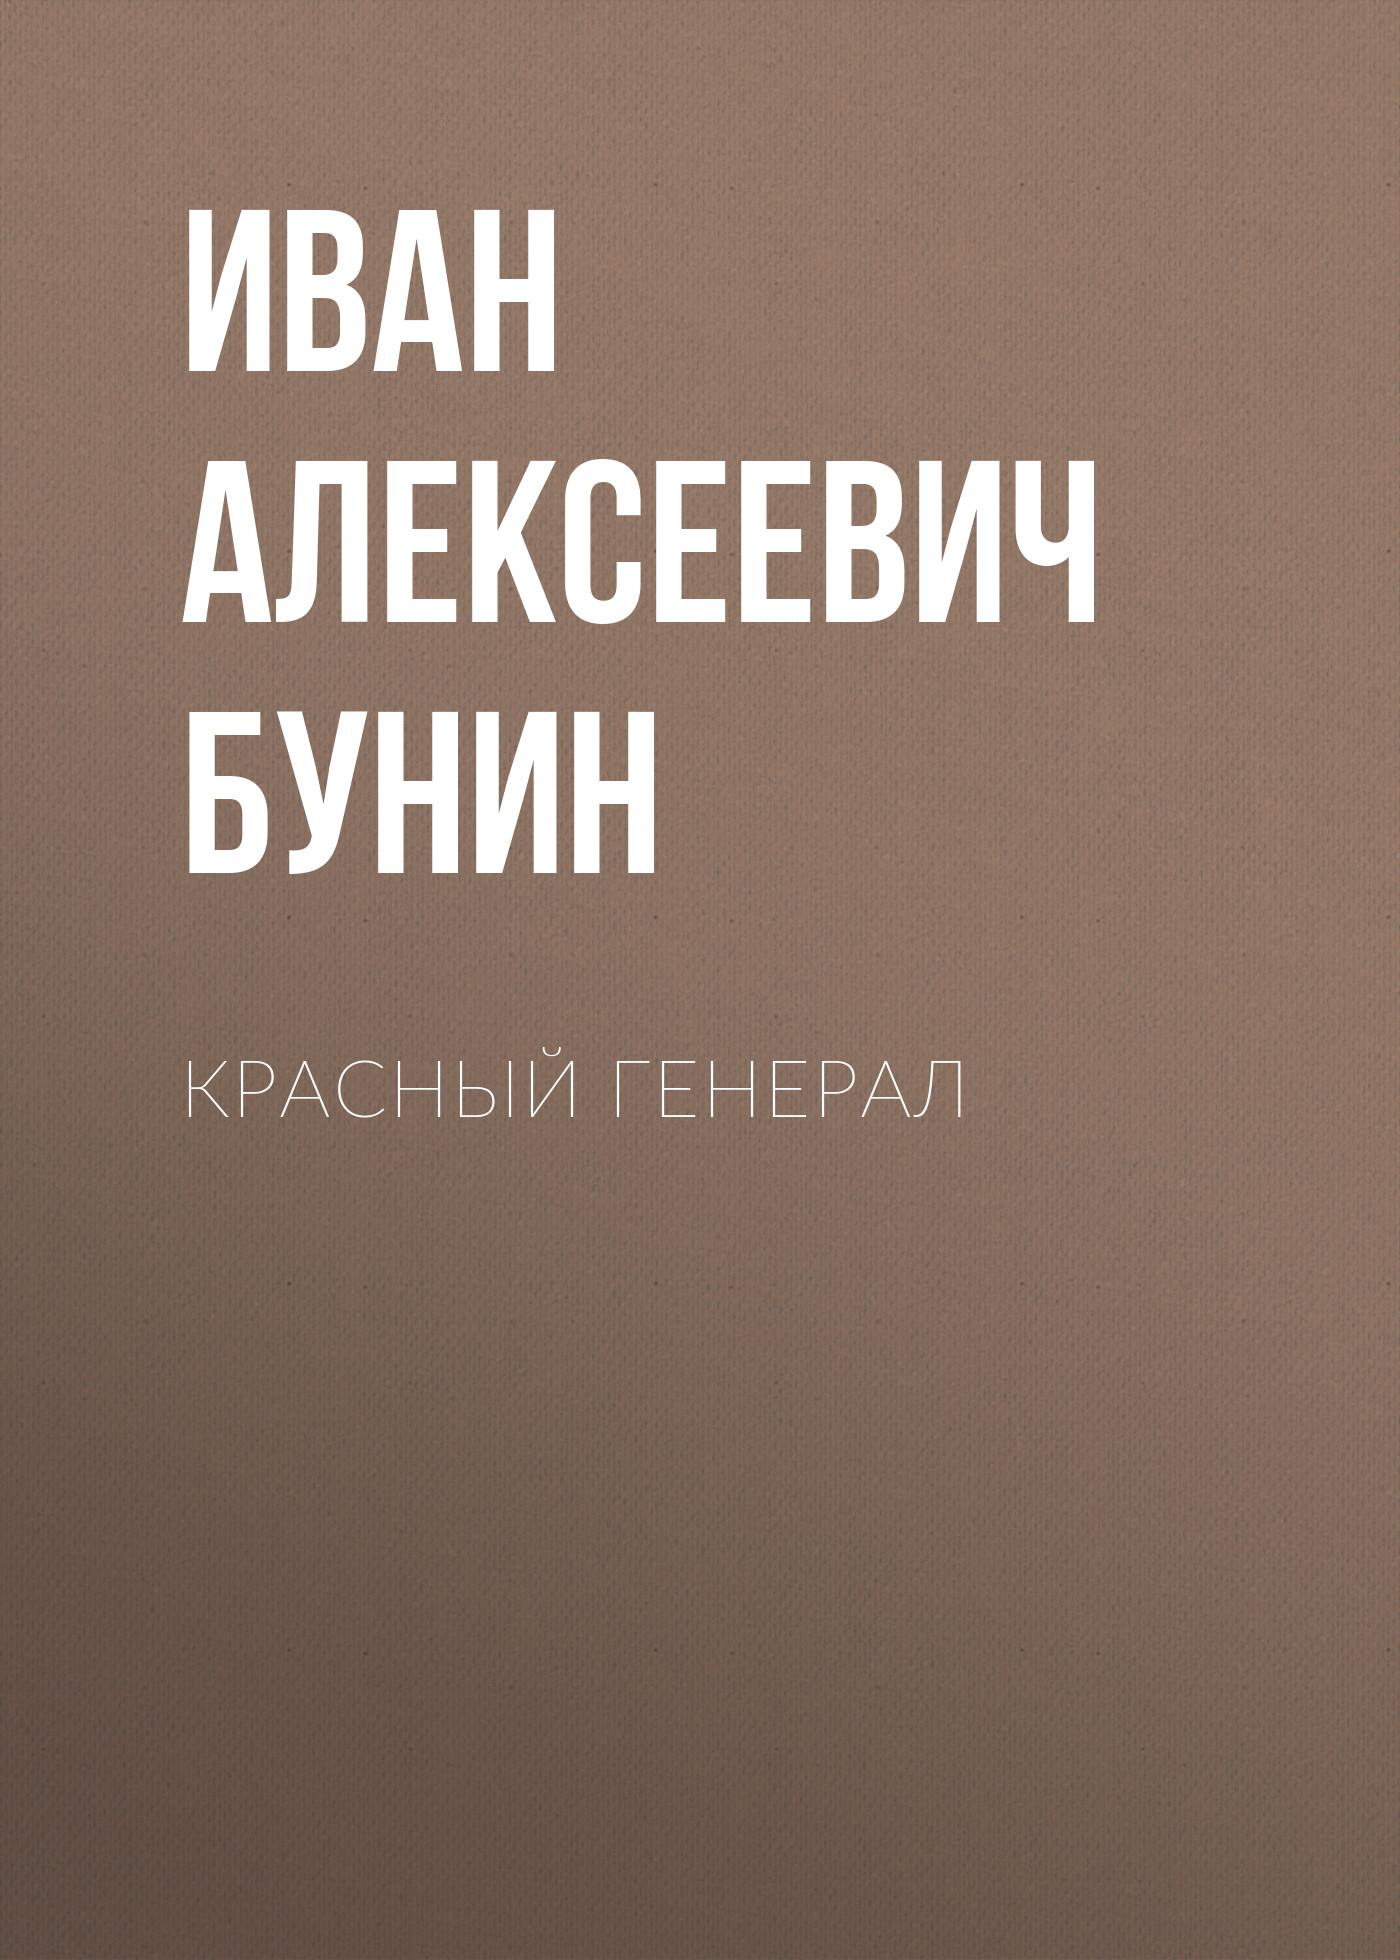 Иван Бунин Красный генерал цены